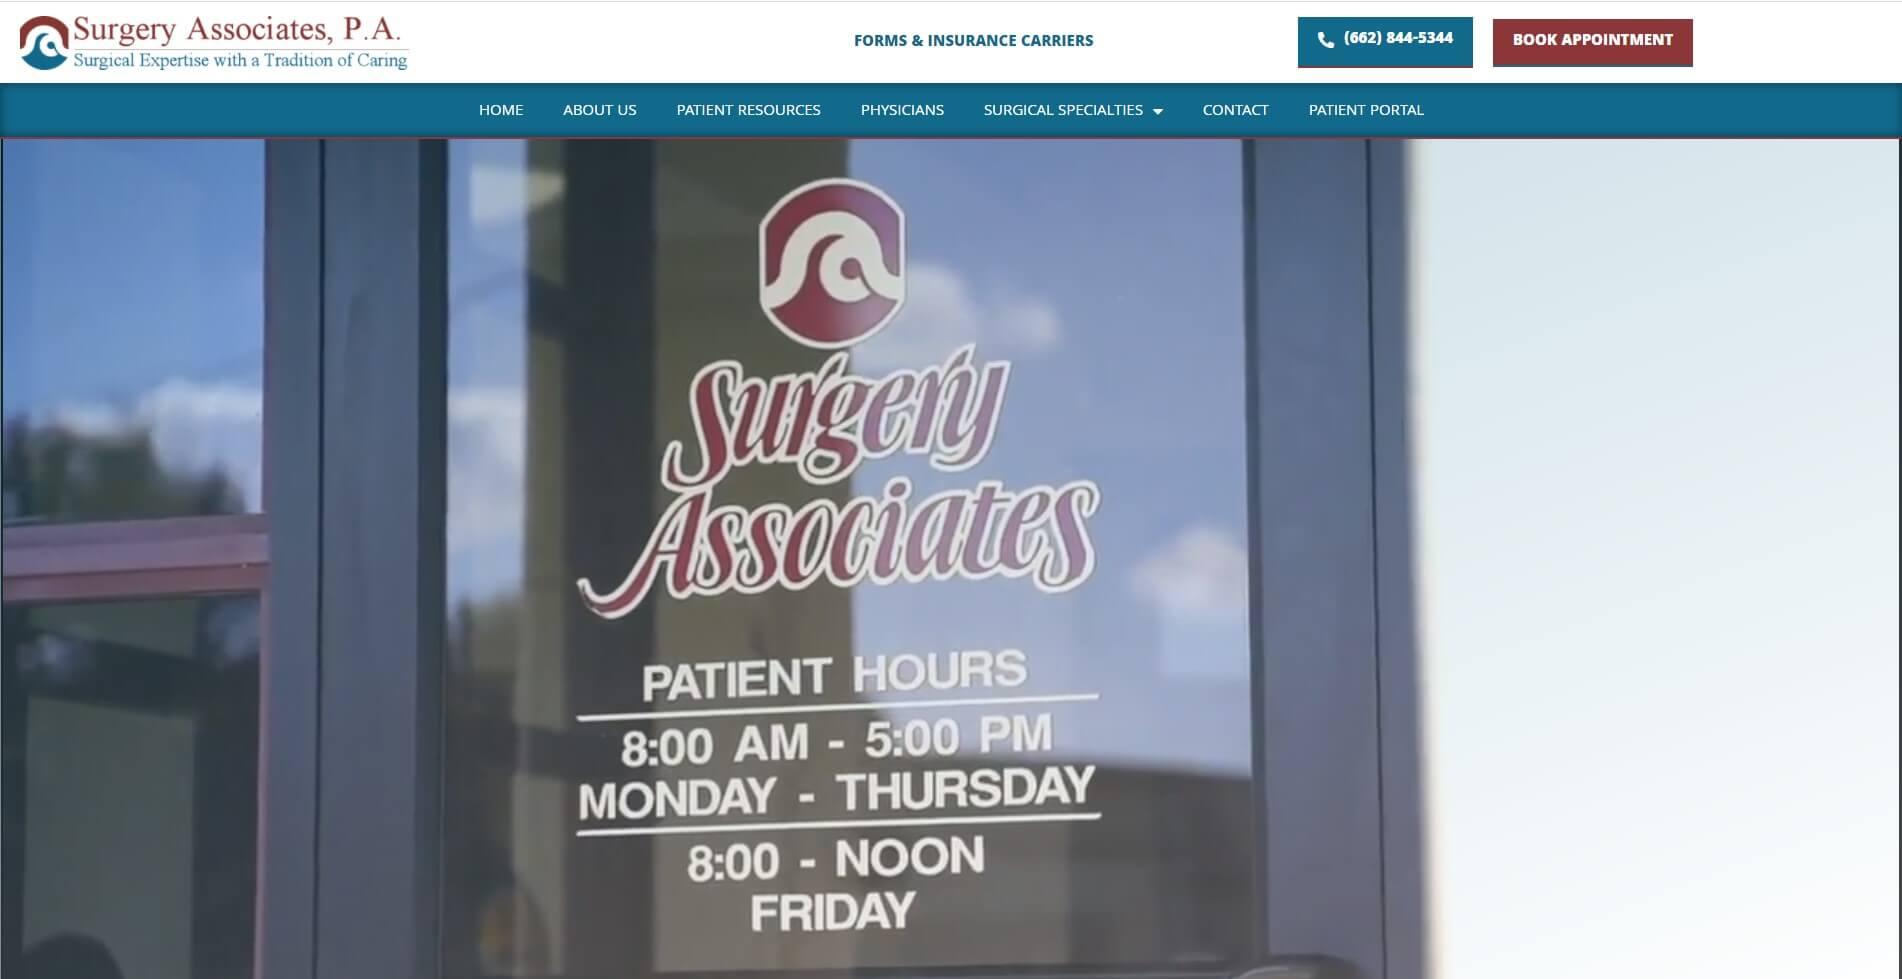 medical - surgey associates